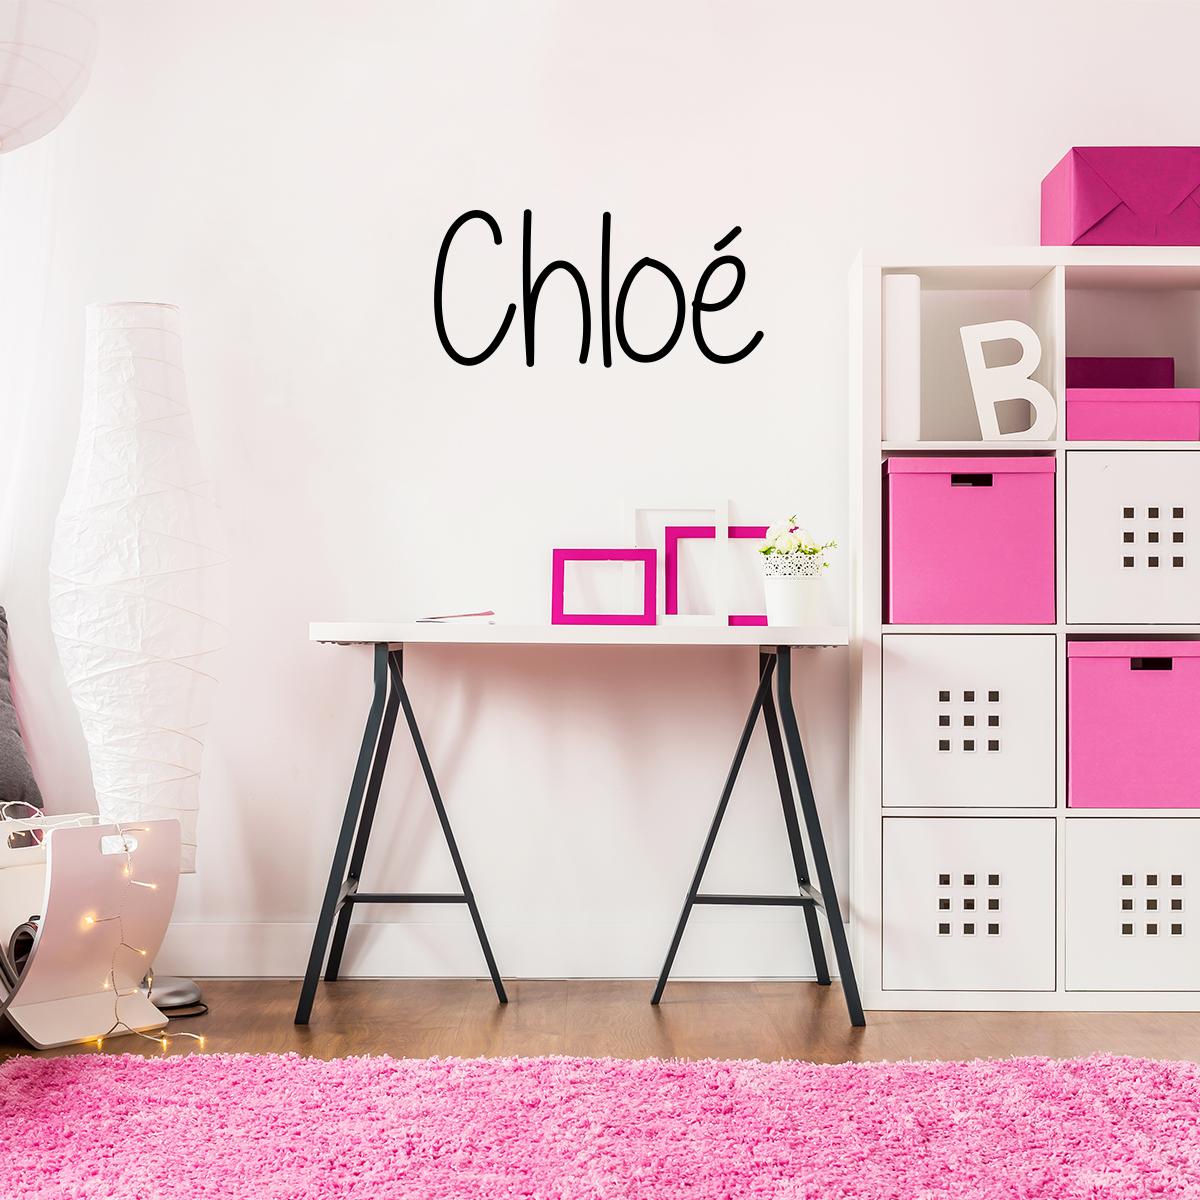 sticker pr nom personnalisable scolaire agr able. Black Bedroom Furniture Sets. Home Design Ideas